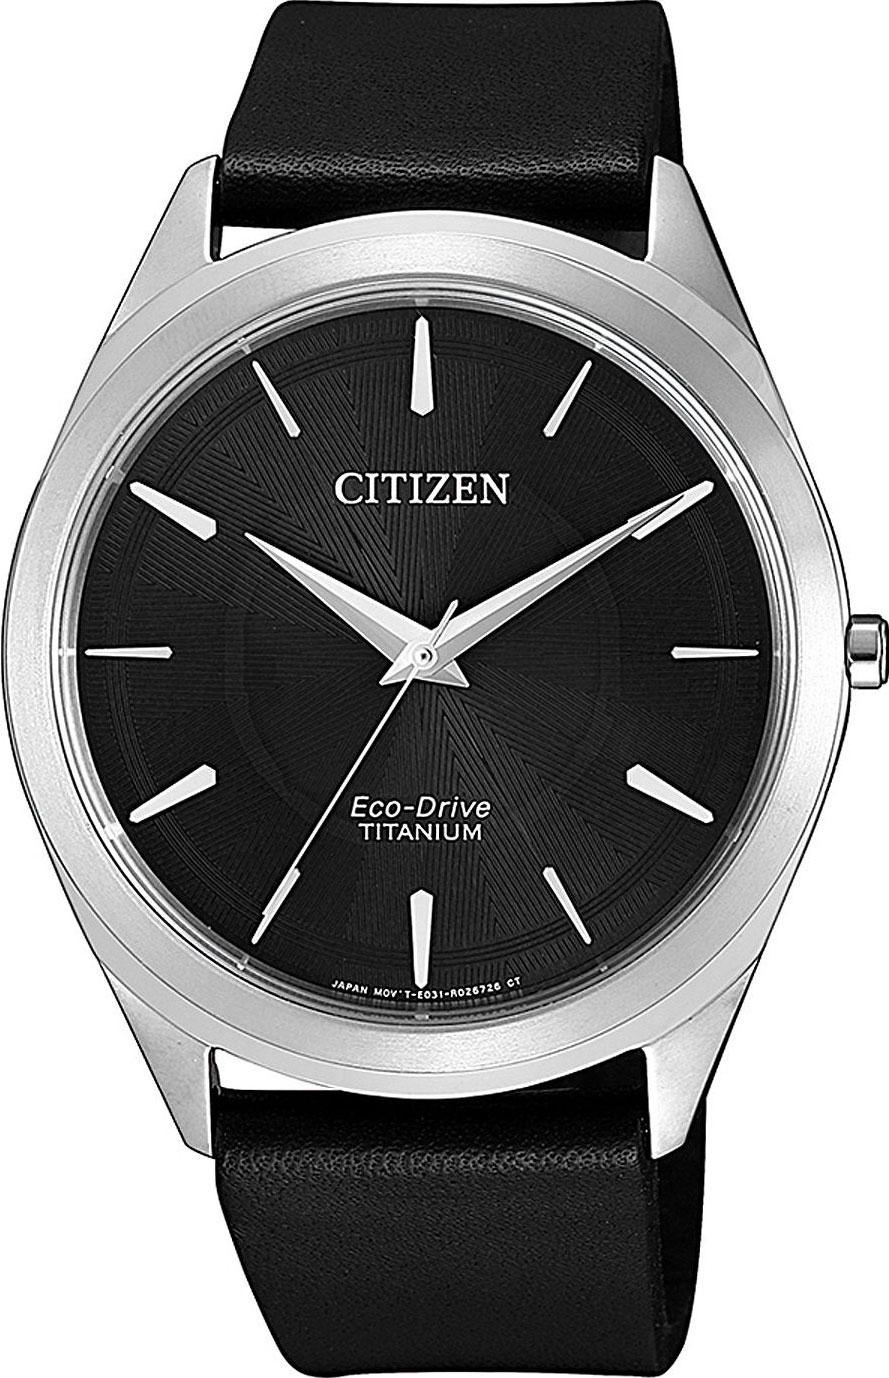 лучшая цена Мужские часы Citizen BJ6520-15E